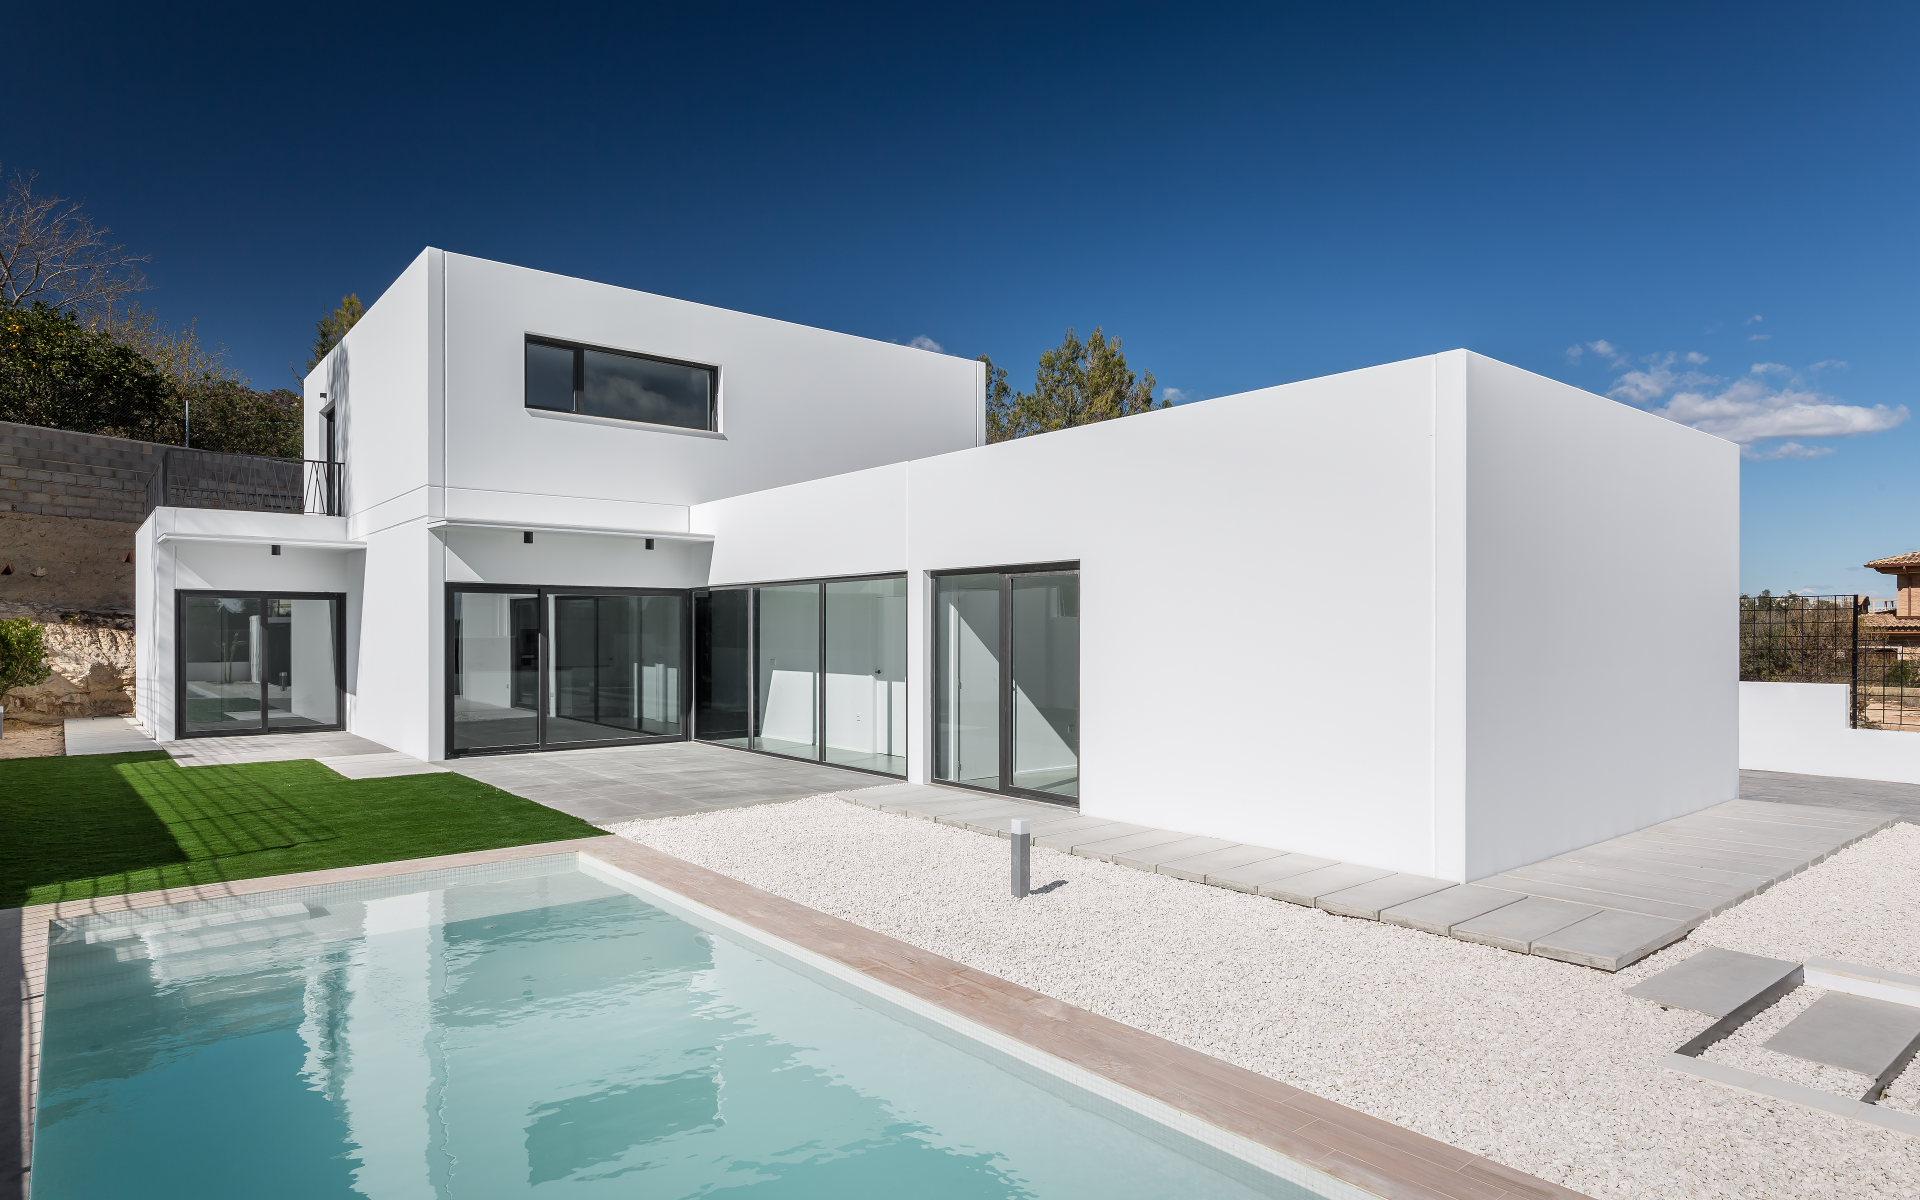 fotografia-arquitectura-valencia-german-cabo-viraje-el-vedat-torrent (5)